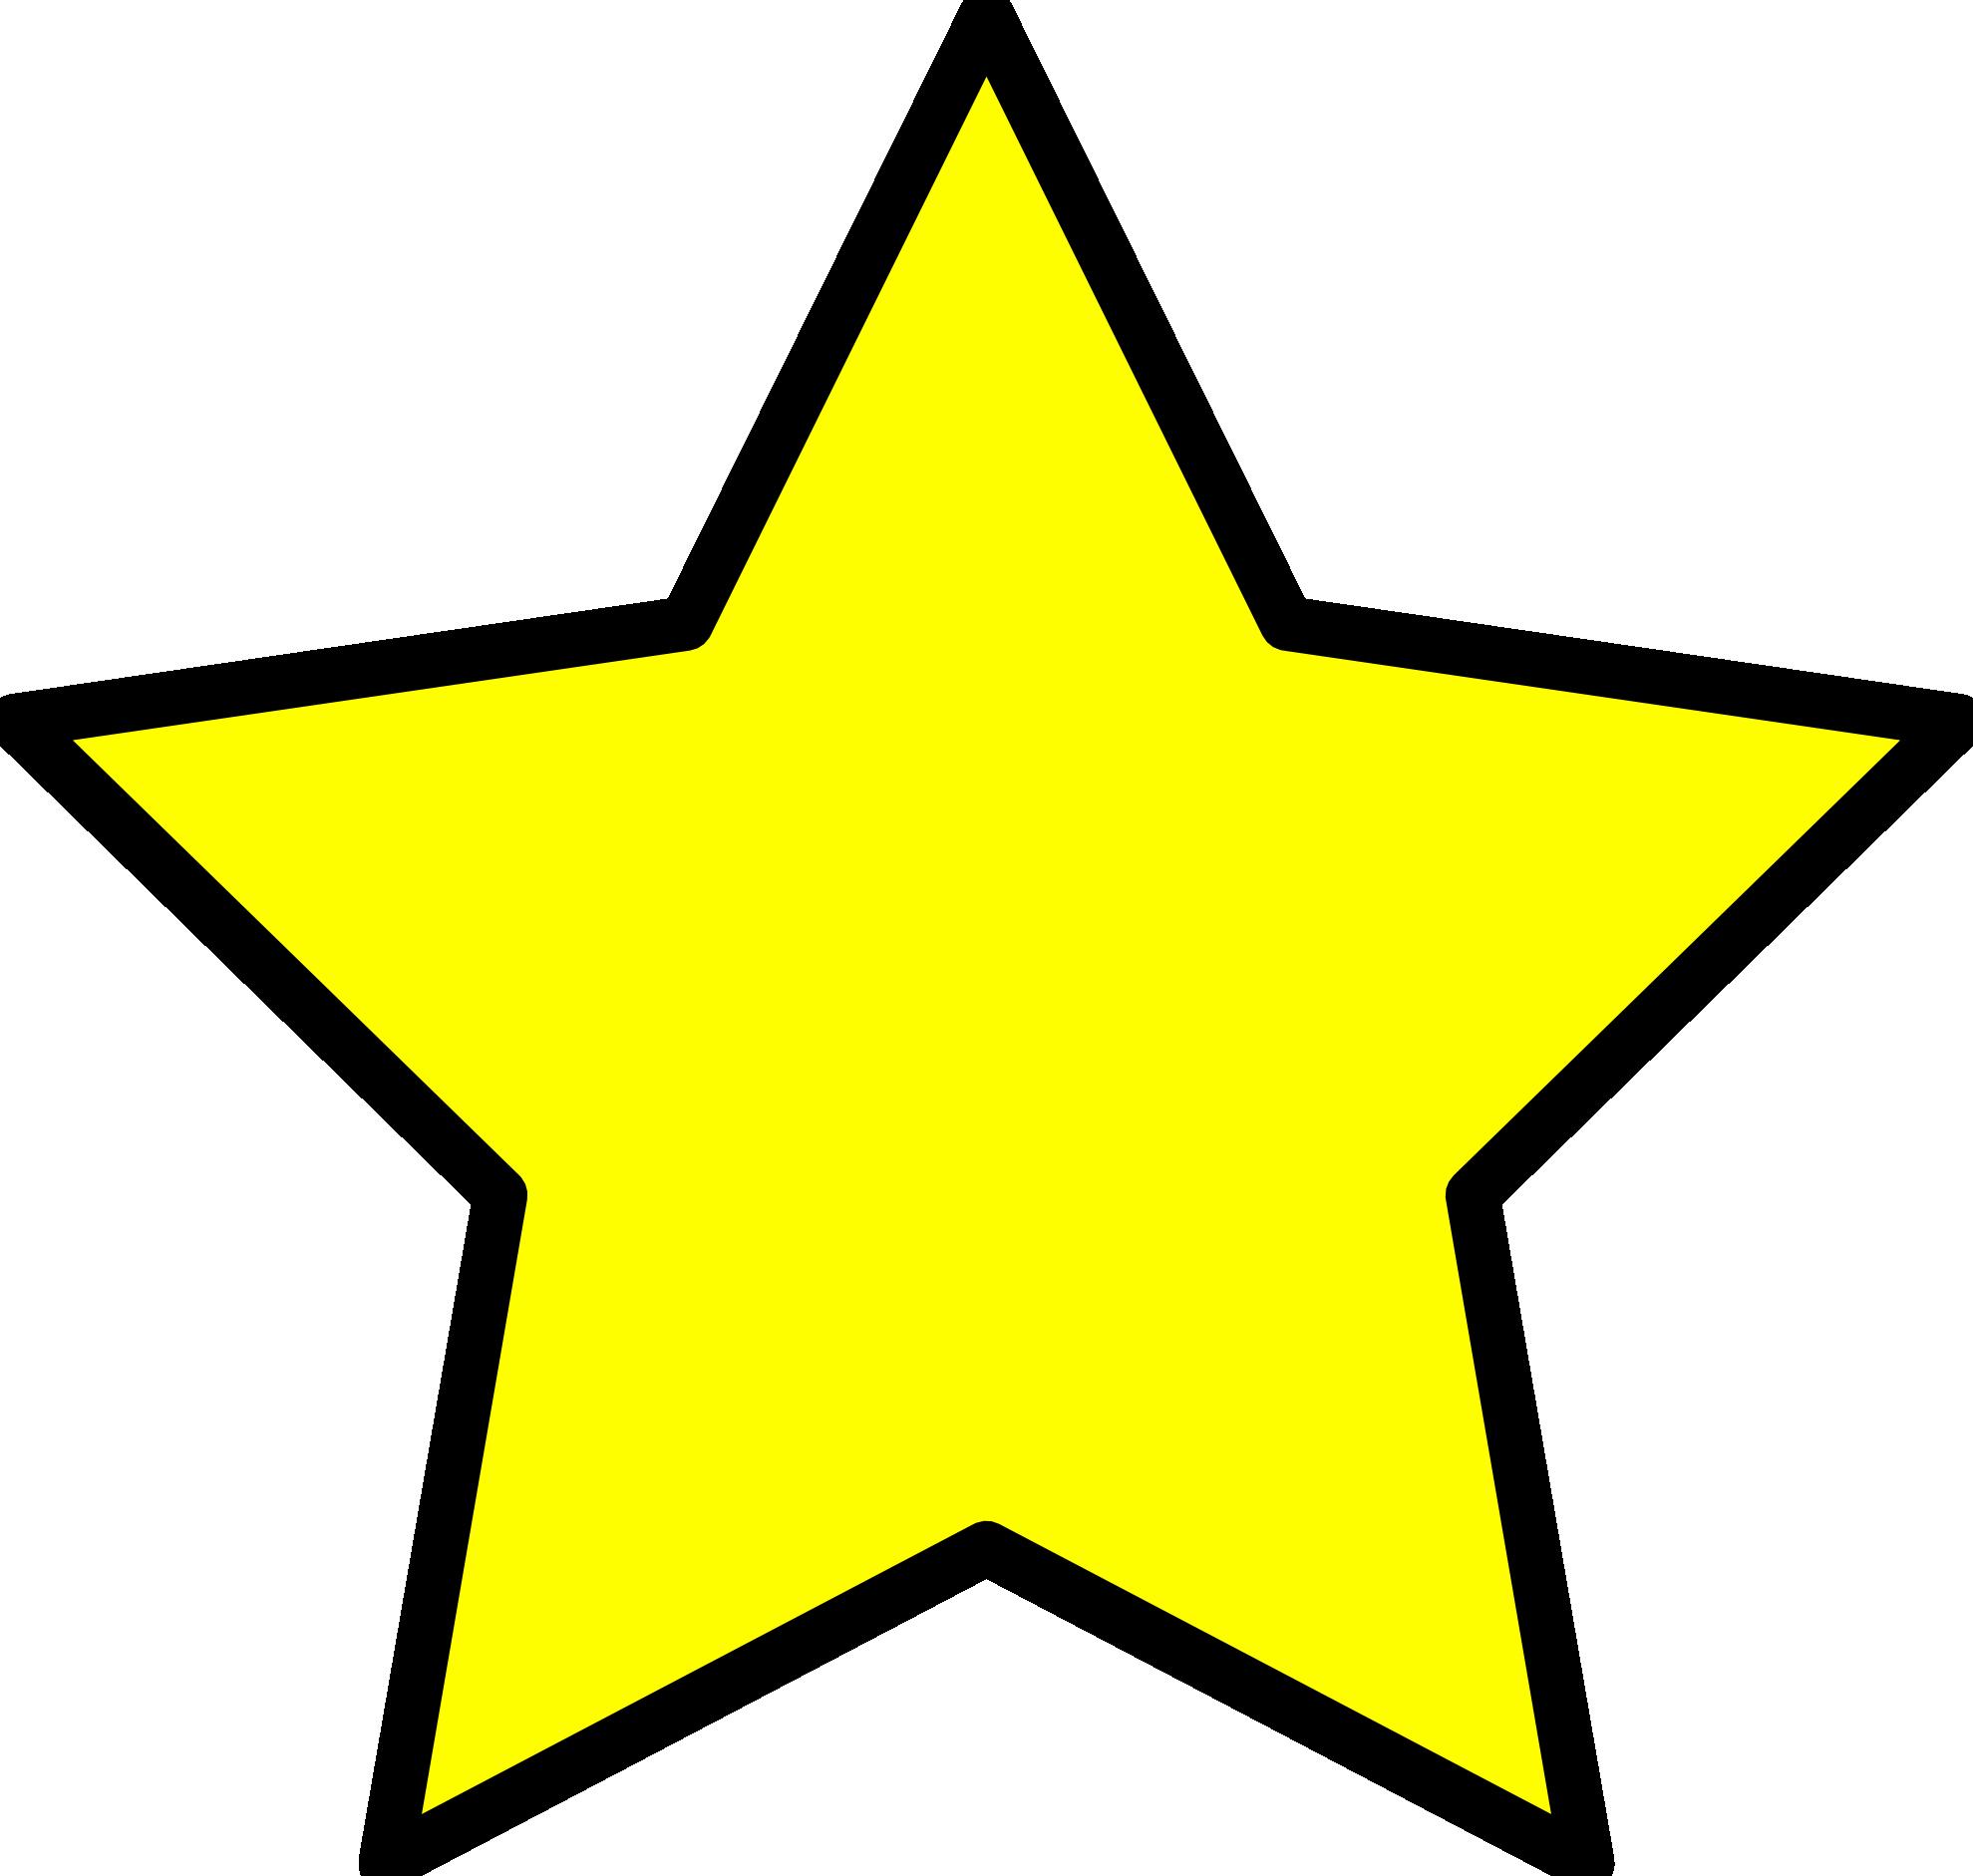 Falling Stars clipart yellow star Yellow Star Bus Clipart Star